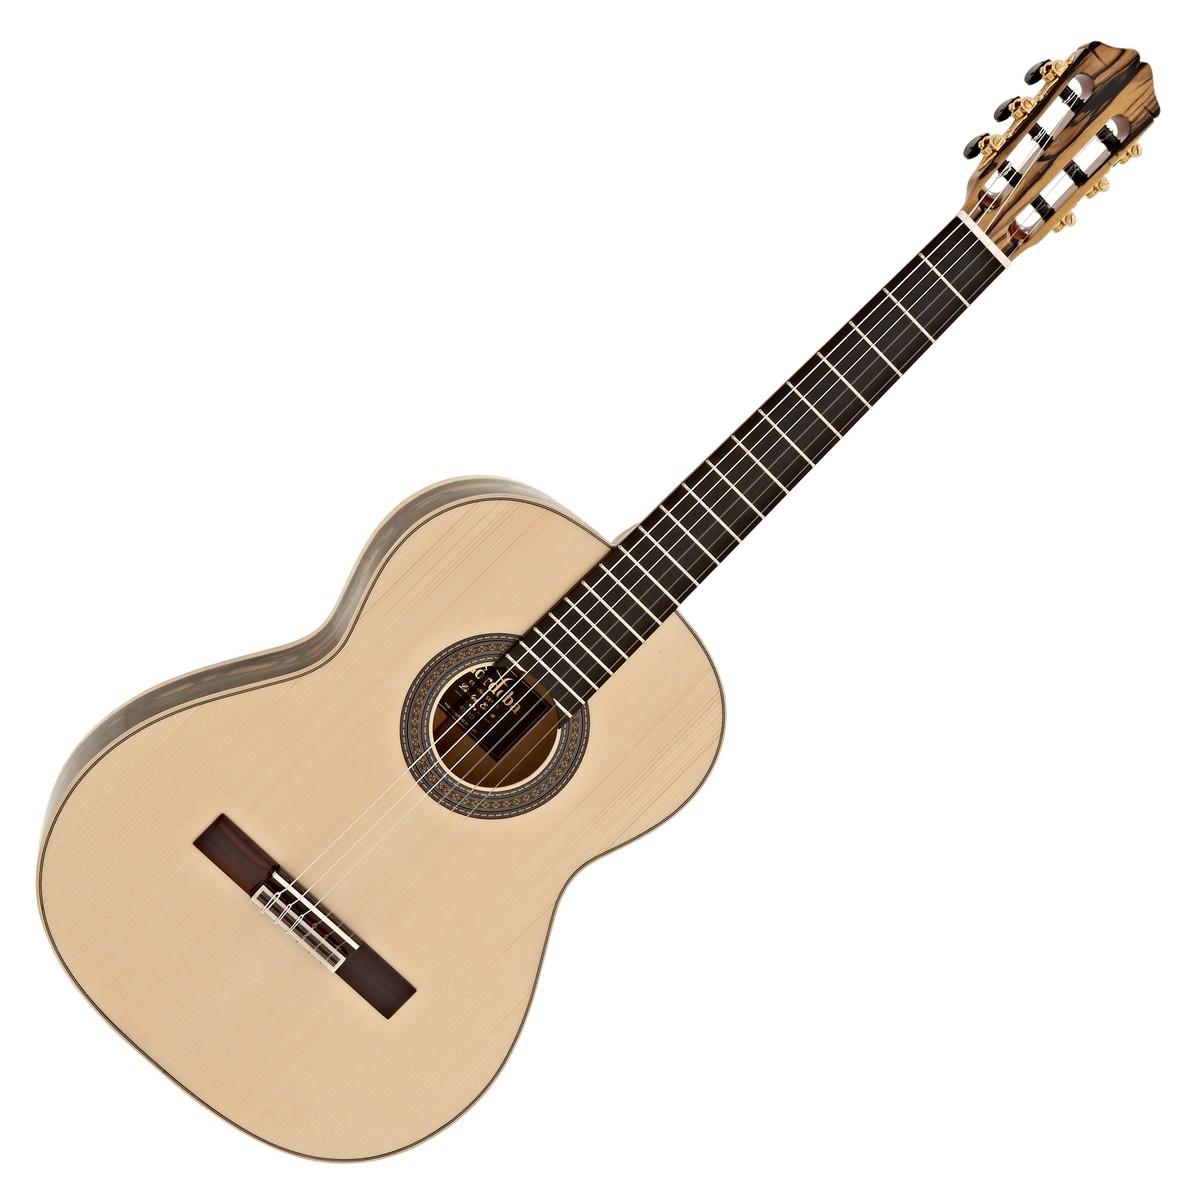 guitare classique definition